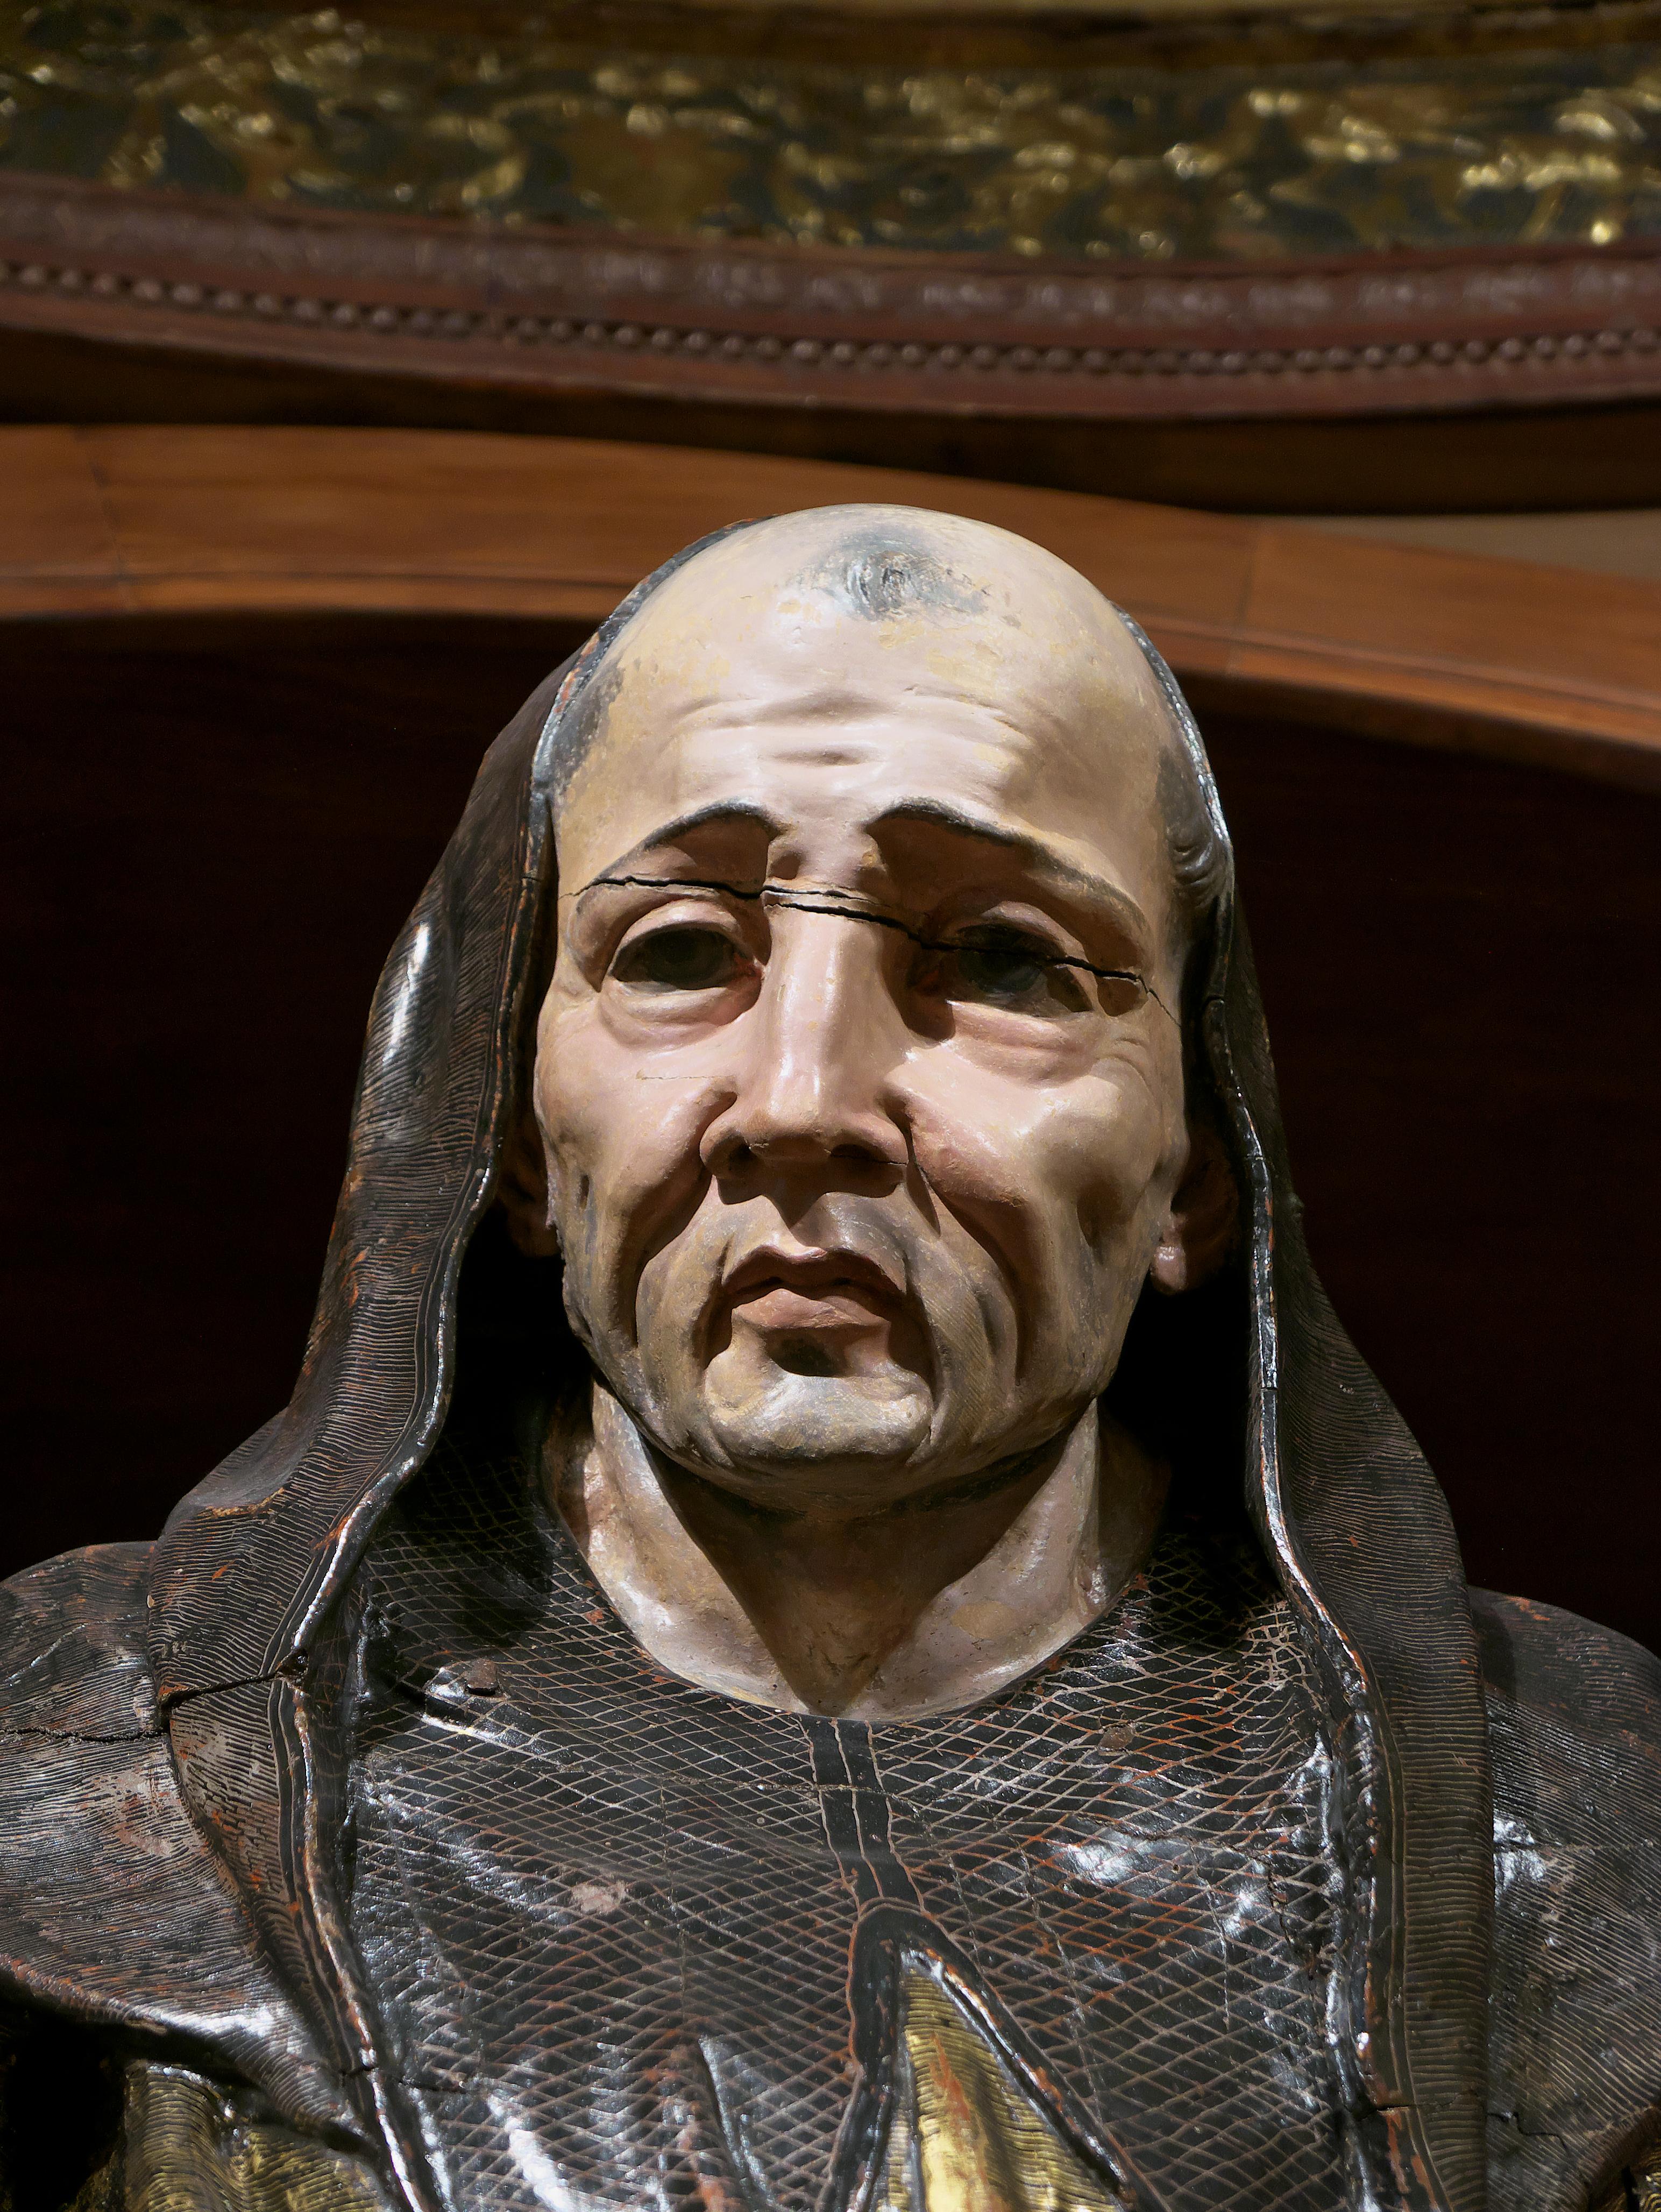 https://upload.wikimedia.org/wikipedia/commons/7/7f/San_Benito%2C_Alonso_Berruguete.jpg